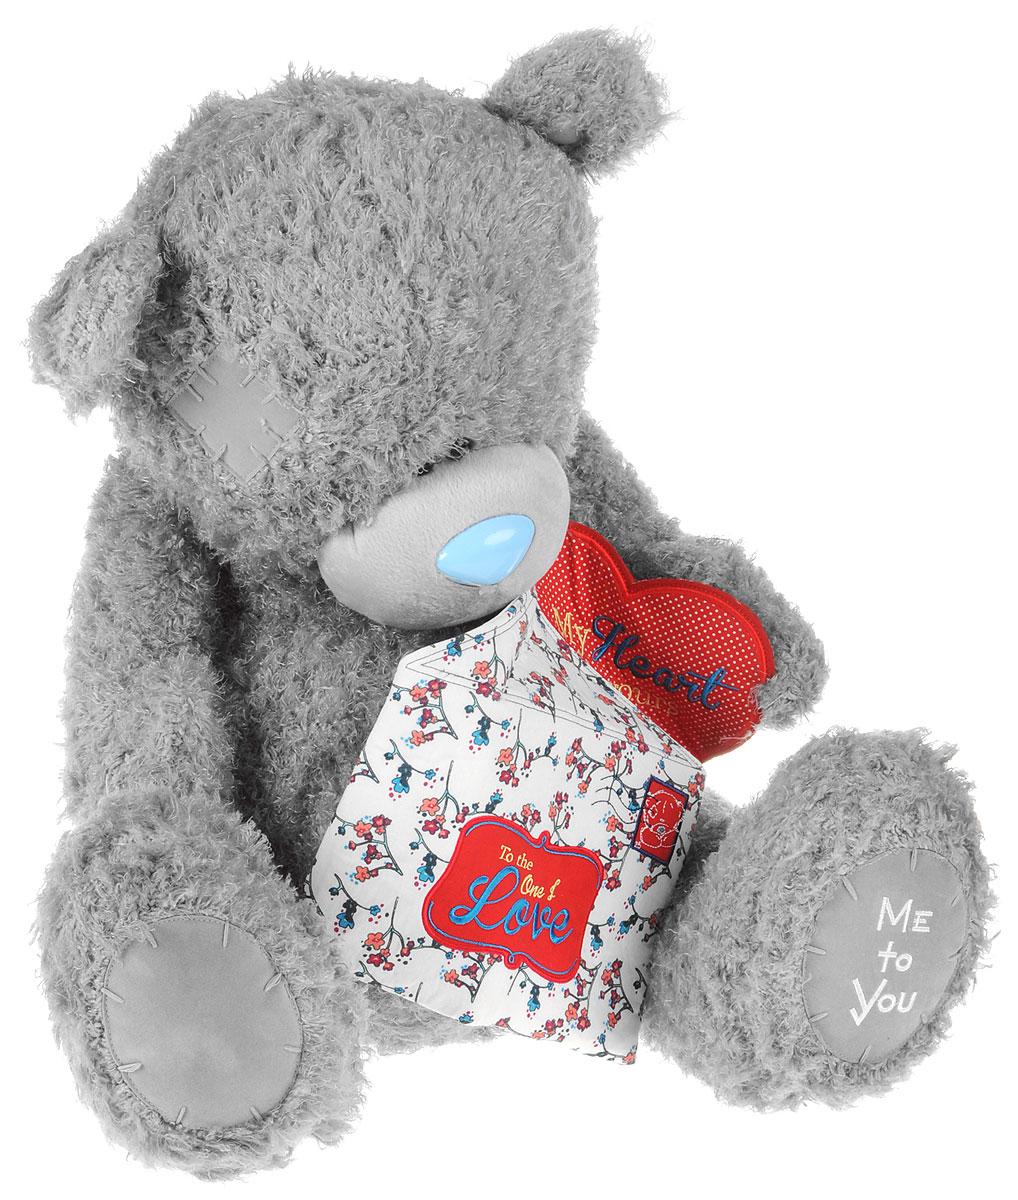 Me to You Мягкая игрушка Мишка Тедди 62 см брелок игрушка мягкая серия me to you 8см в асс g01w3805